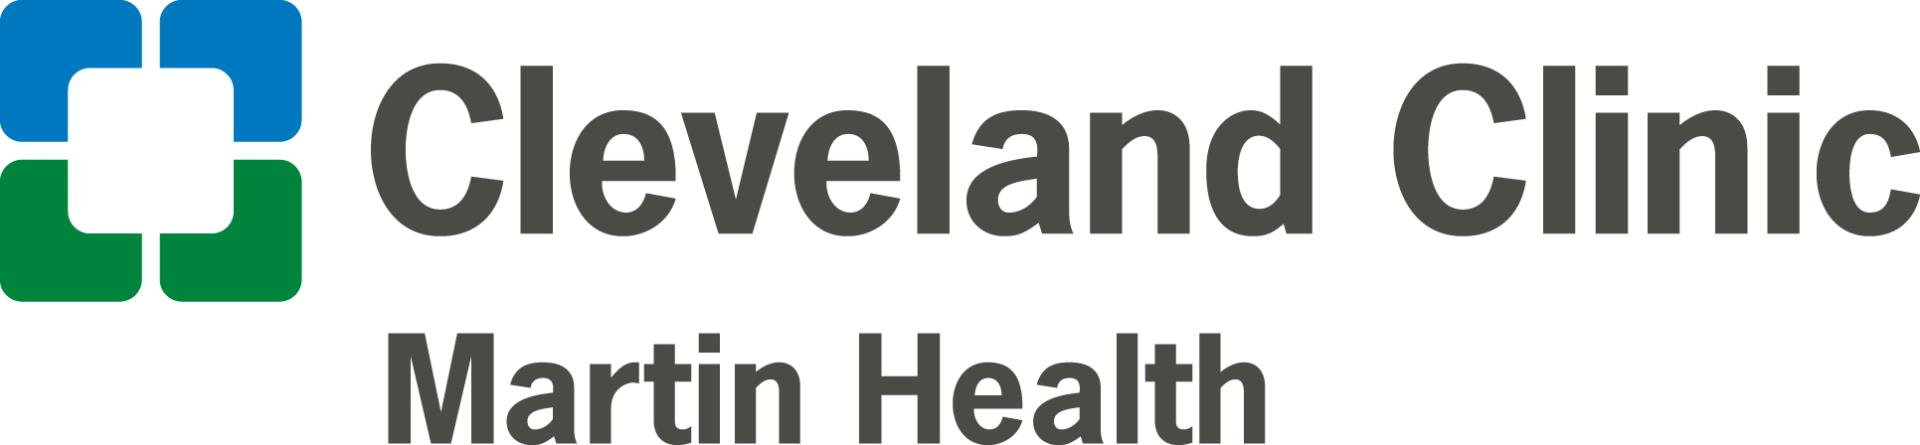 Cleveland Clinic Martin Health Logo